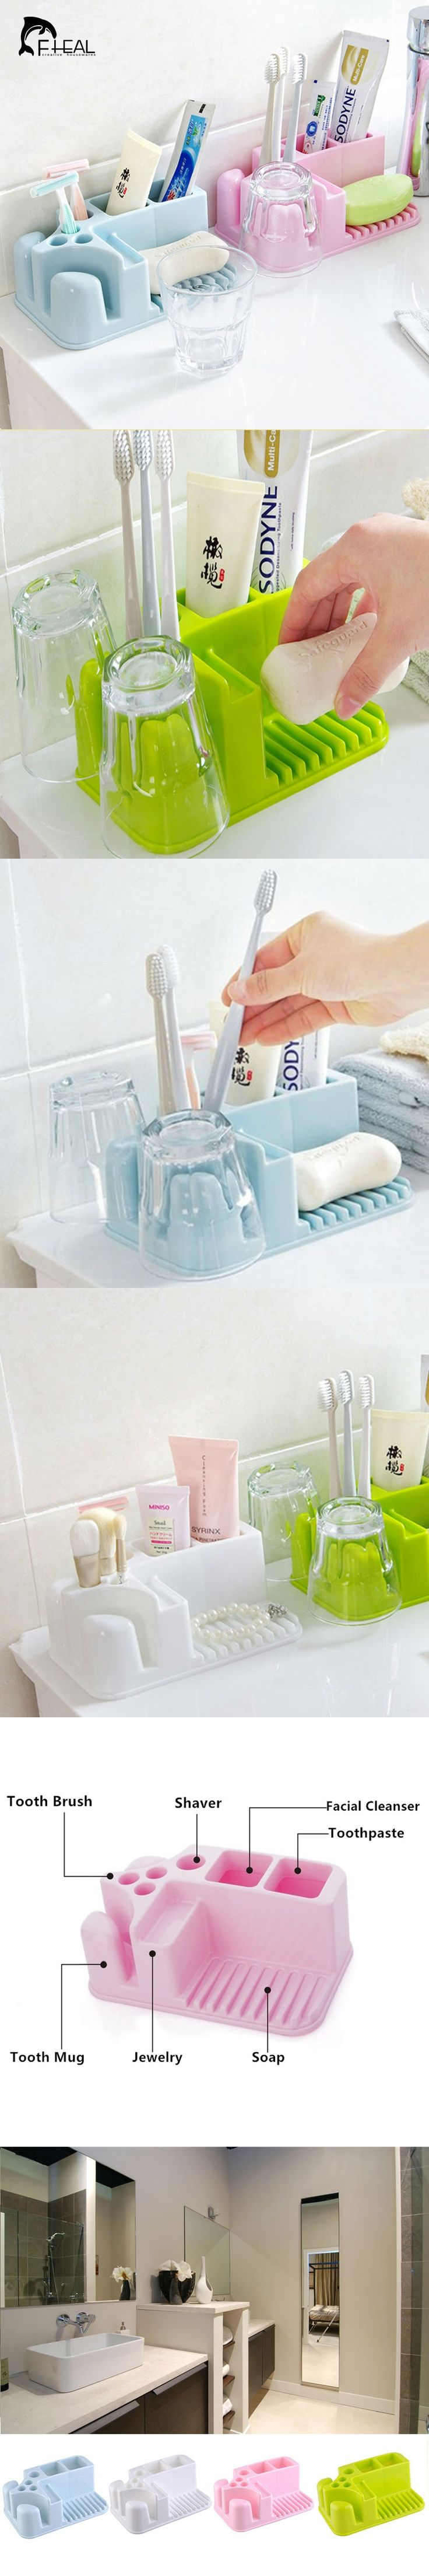 Multifunction Rectangle Kitchen Bathroom Shower Storage Box Toothbrush Toothpaste Tooth Mug Cleanser Cosmetic Organization Shelf